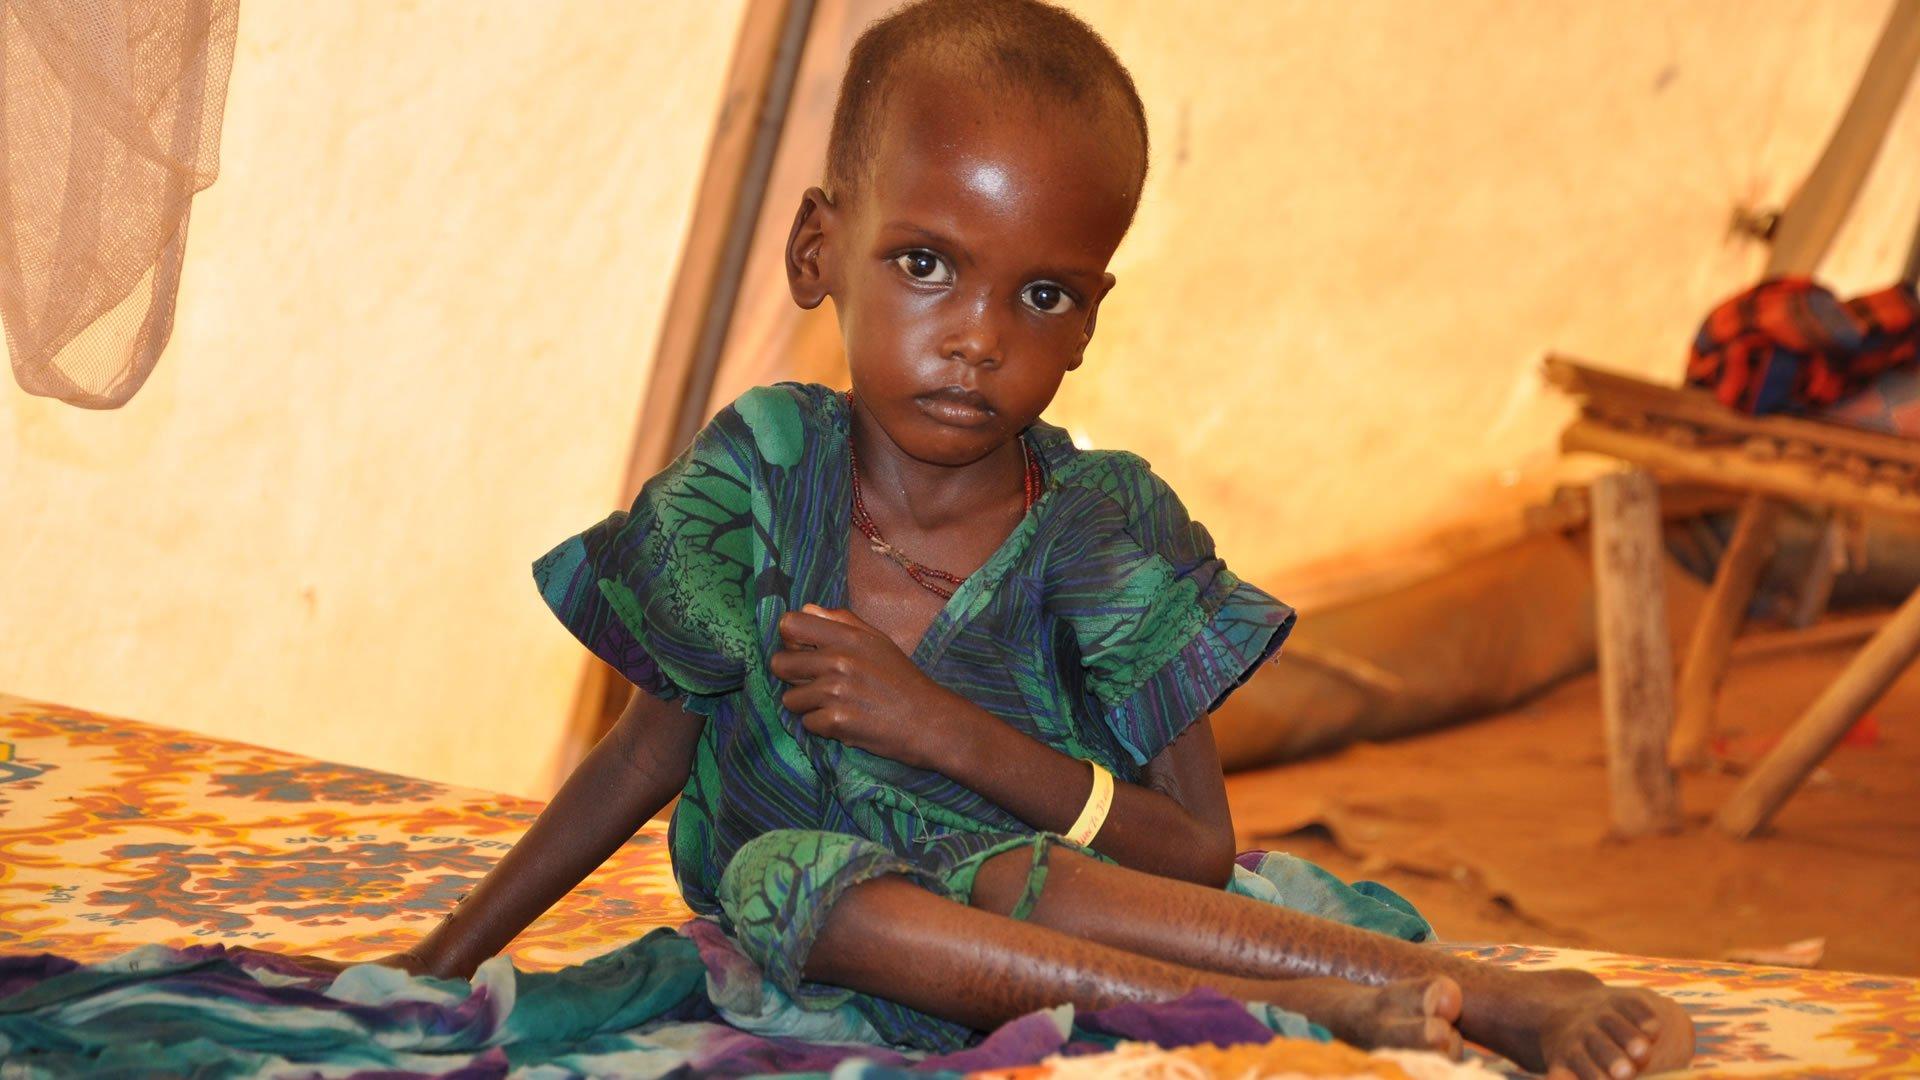 Fotos desnutrición en África